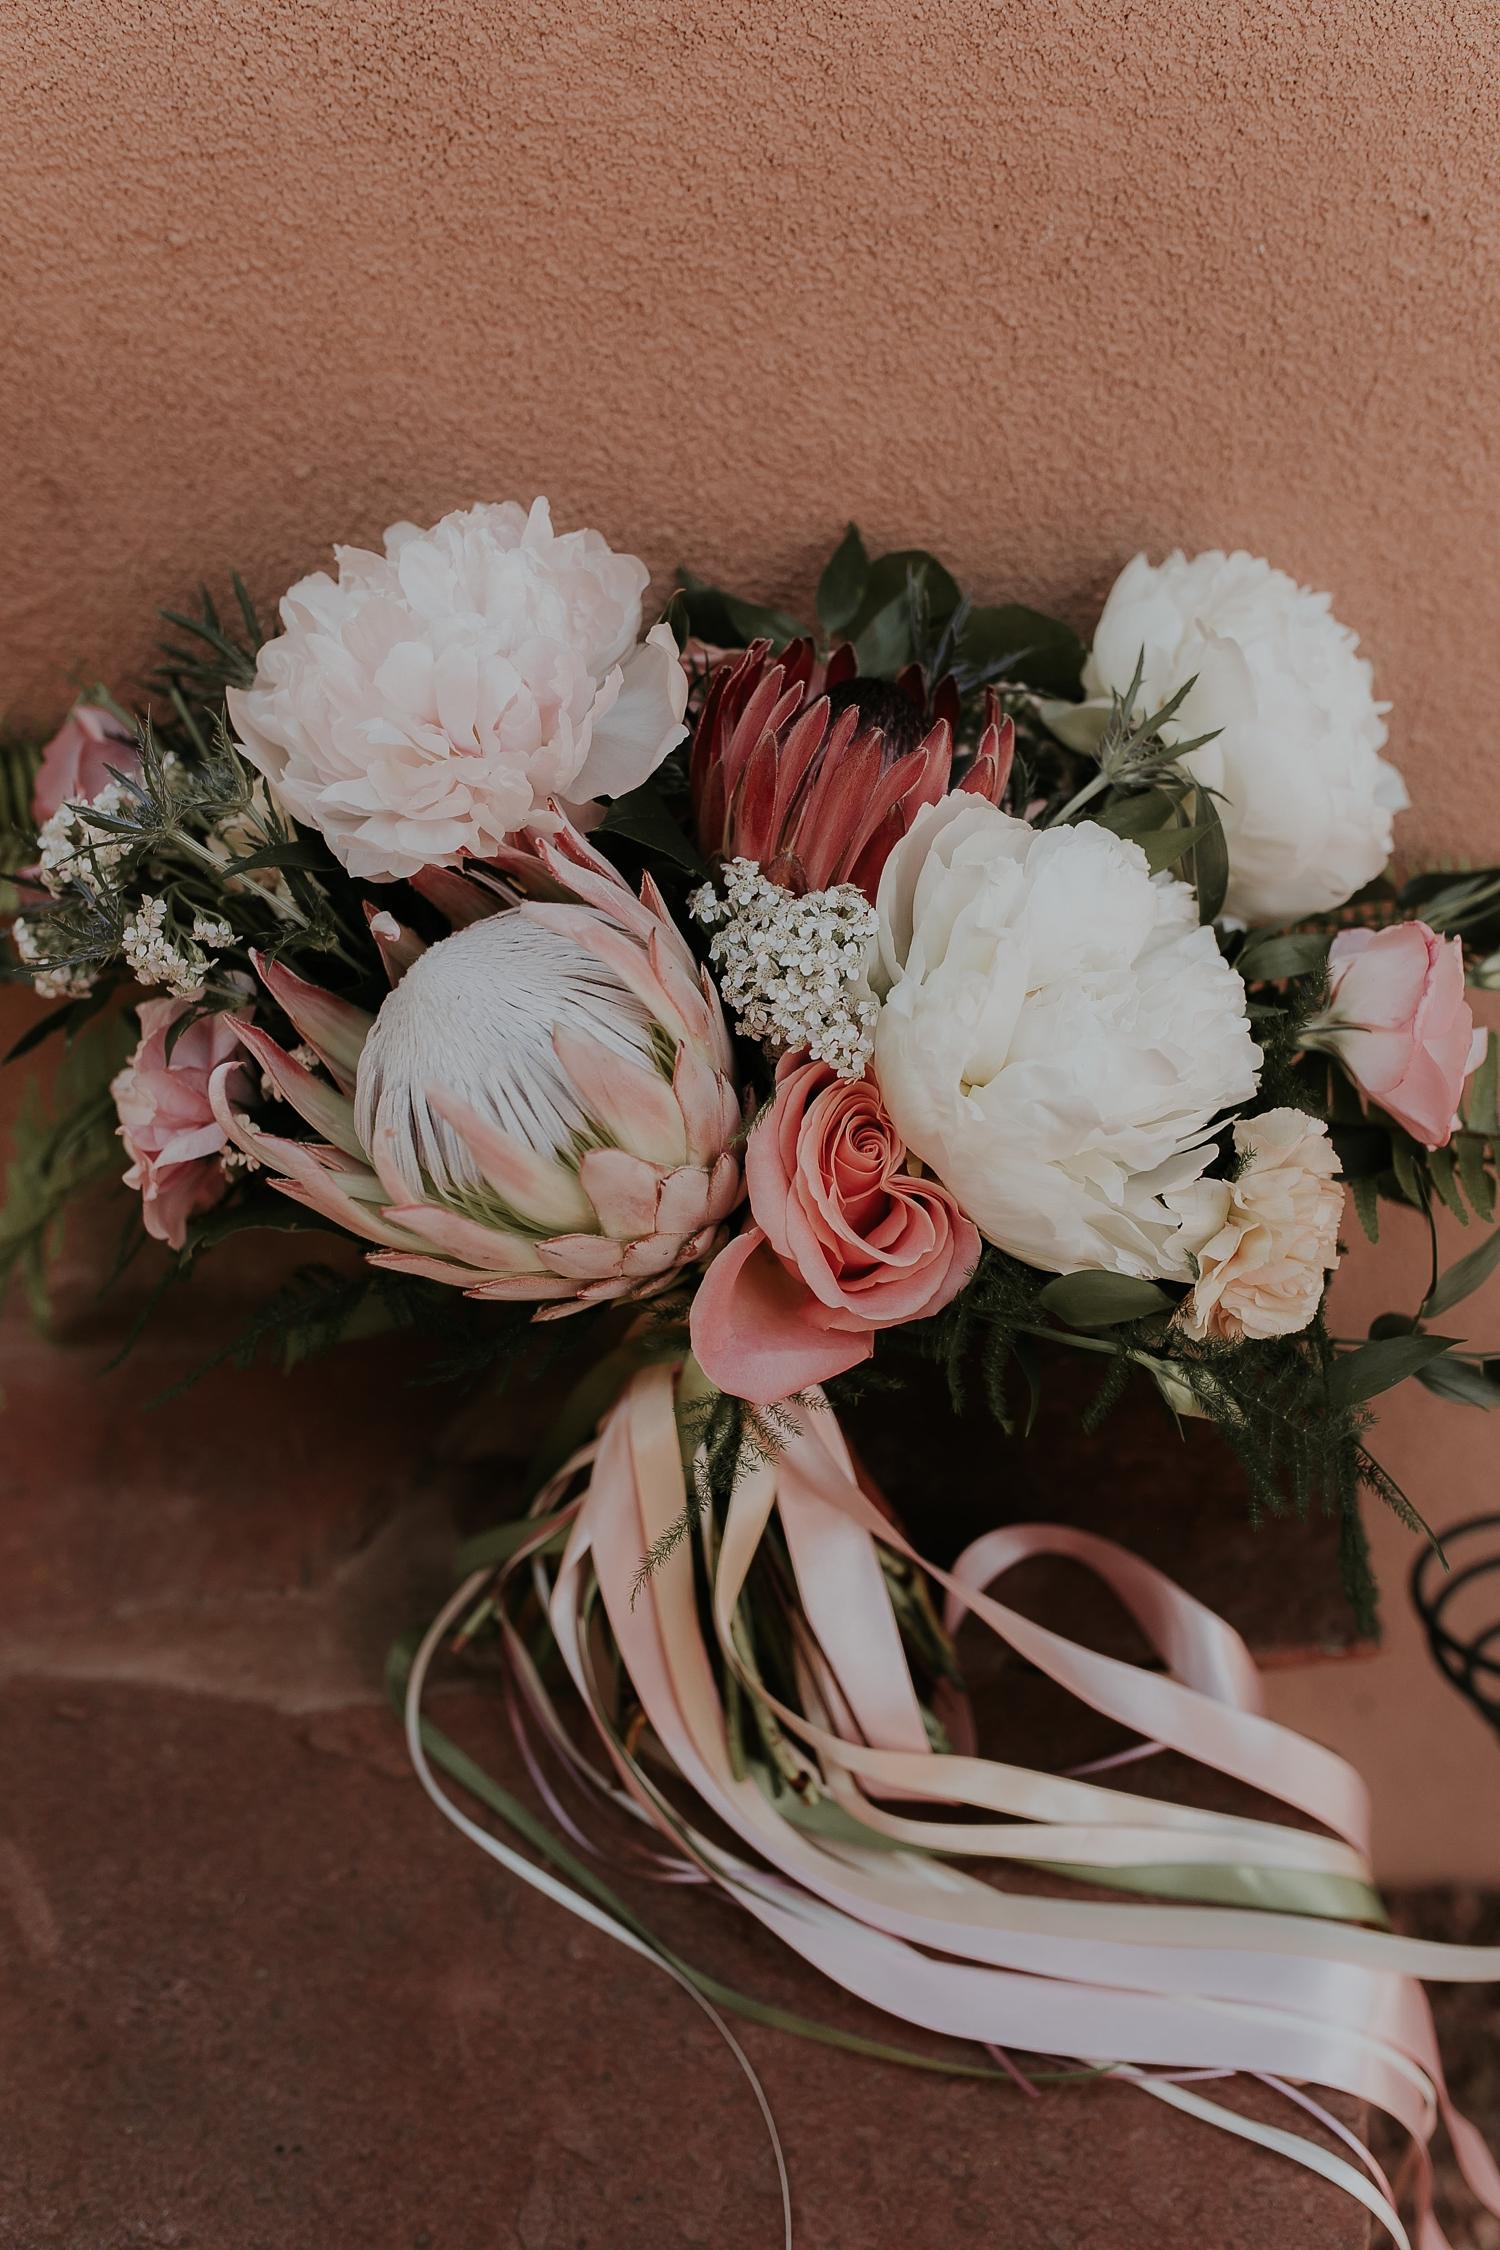 Alicia+lucia+photography+-+albuquerque+wedding+photographer+-+santa+fe+wedding+photography+-+new+mexico+wedding+photographer+-+wedding+flowers+-+summer+wedding+flowers_0003.jpg